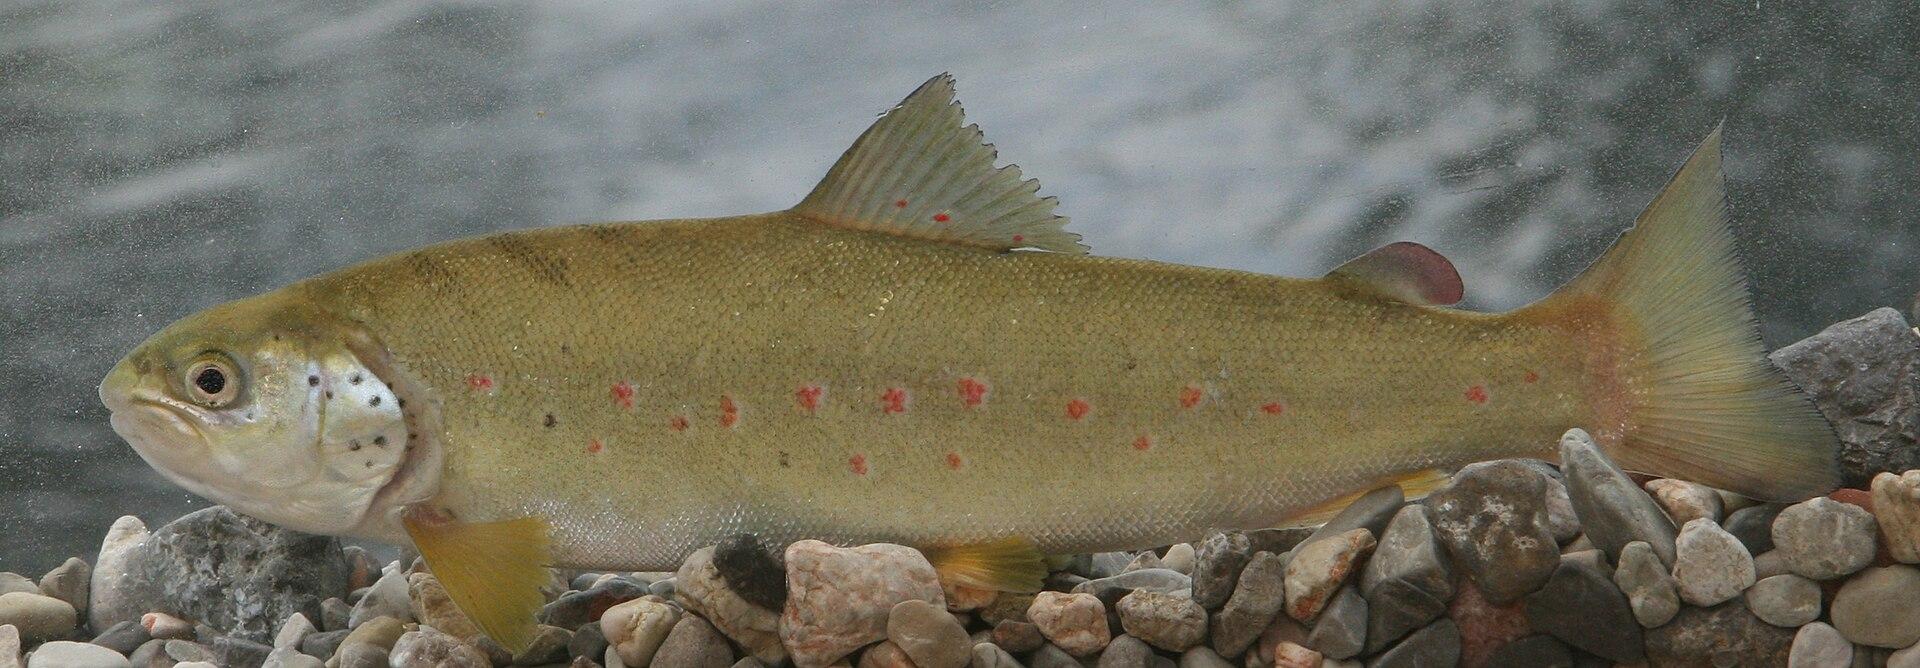 Fish species of the neretva basin wikipedia for Fish representative species